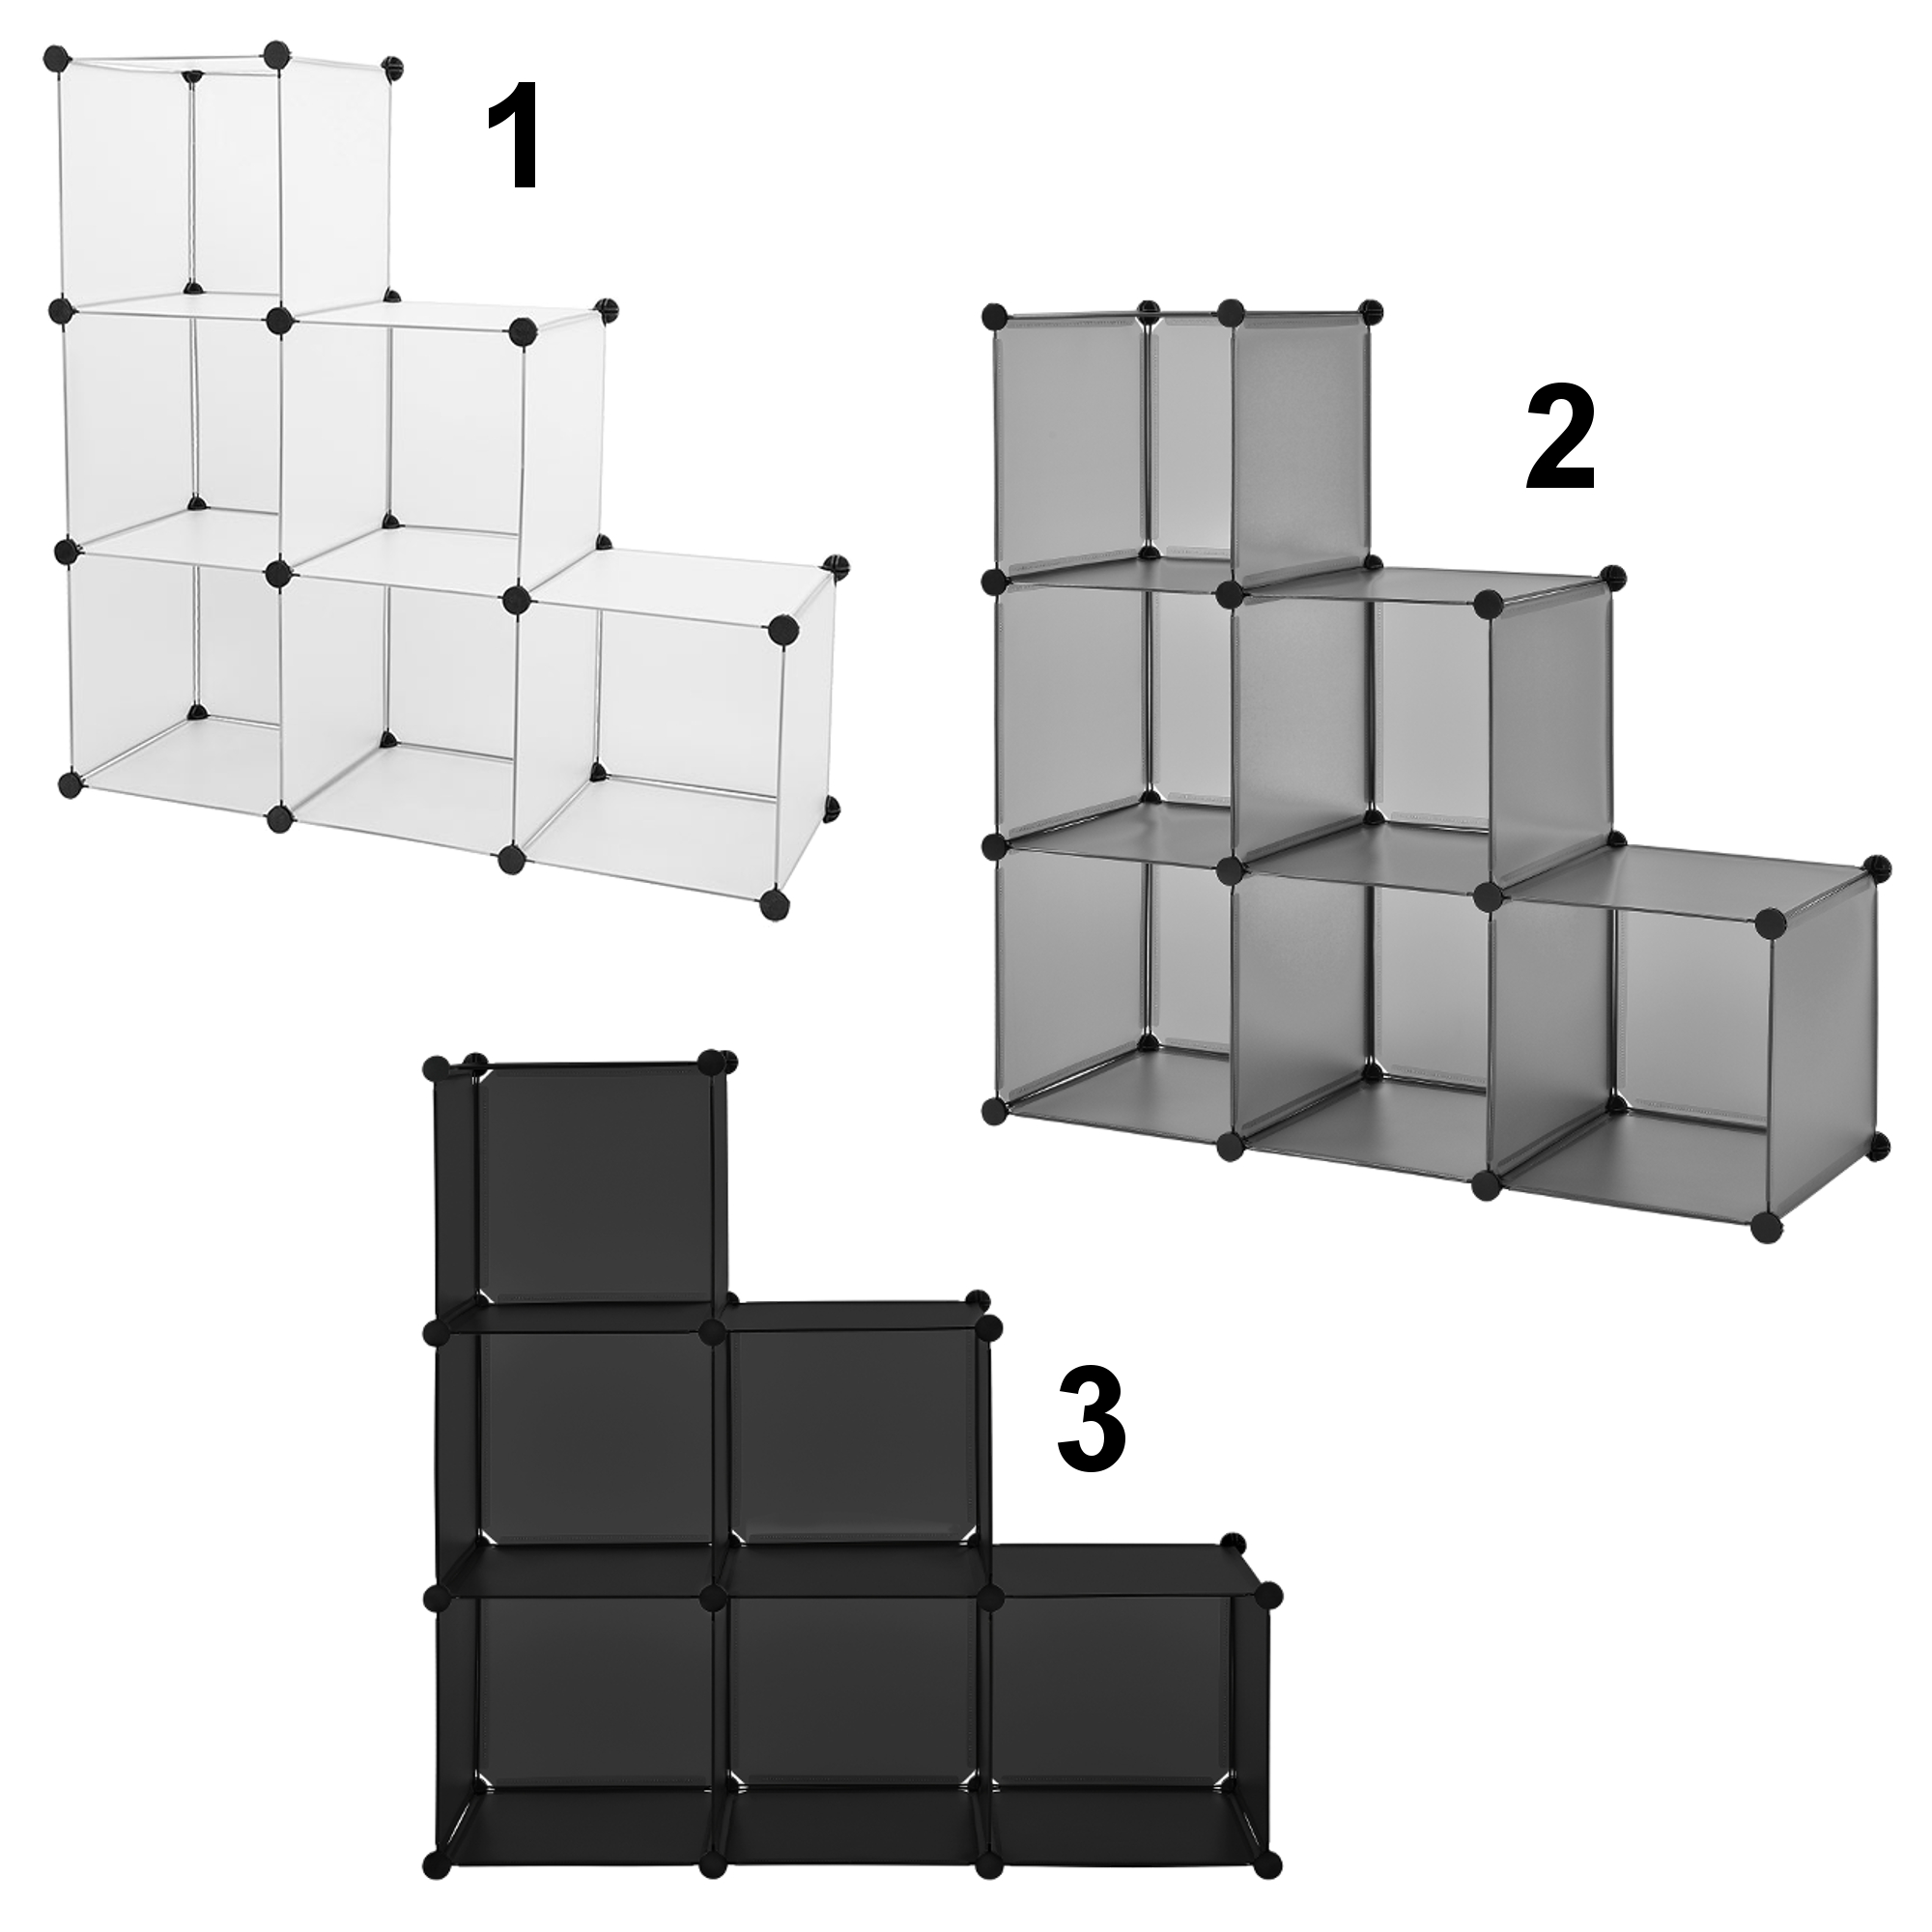 diy system regal schrank 110x110cm garderobe steck bad kleider wand ebay. Black Bedroom Furniture Sets. Home Design Ideas